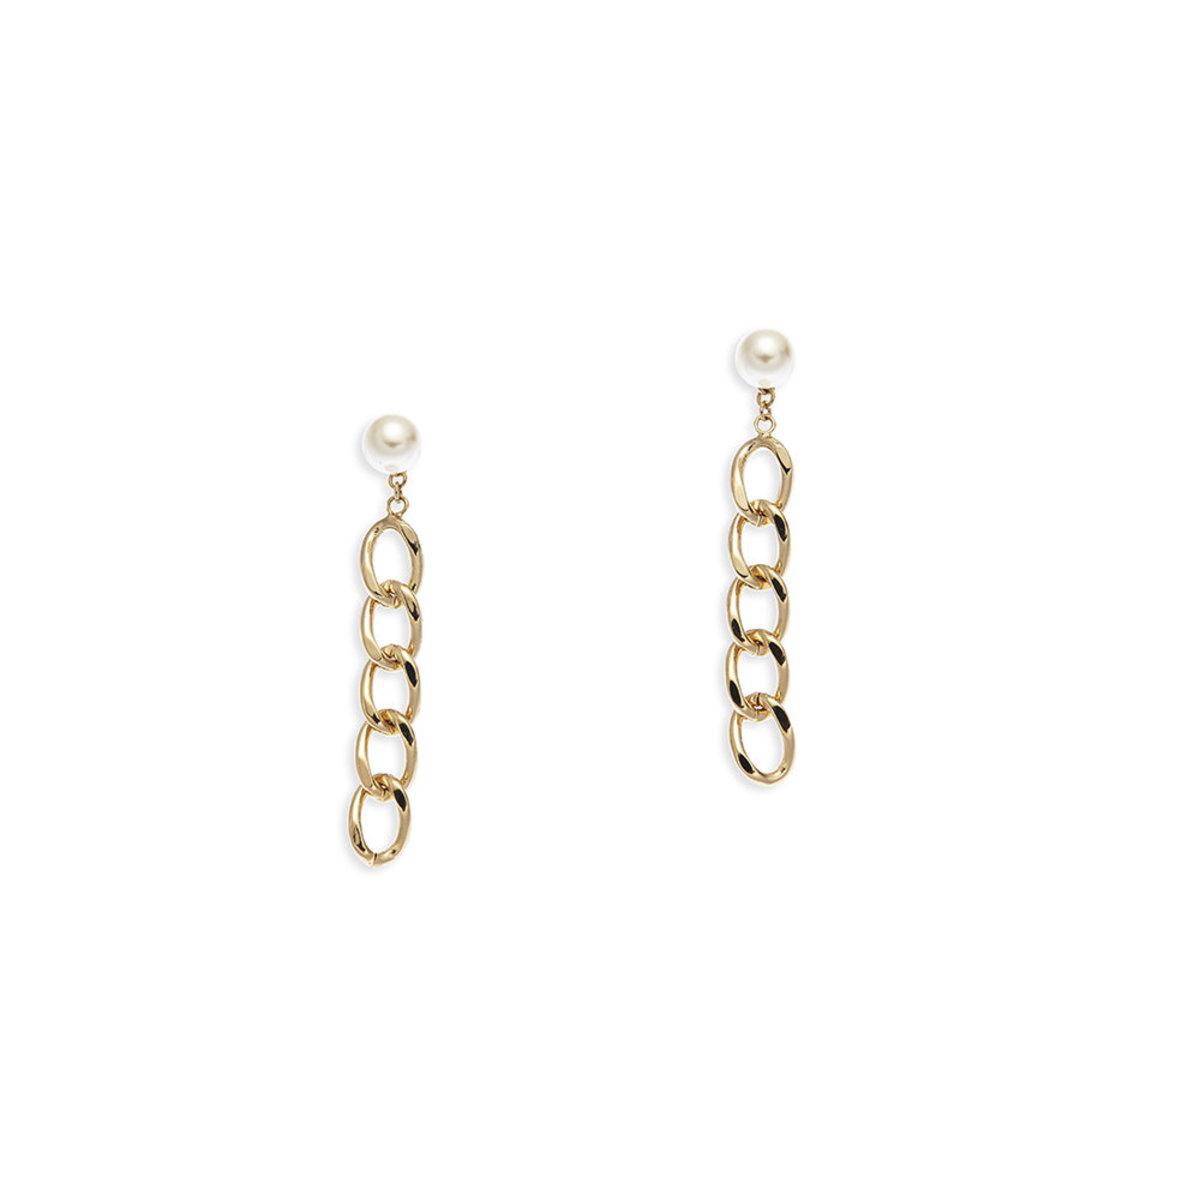 Catena: gold plating, Swarovski pearl clip earrings